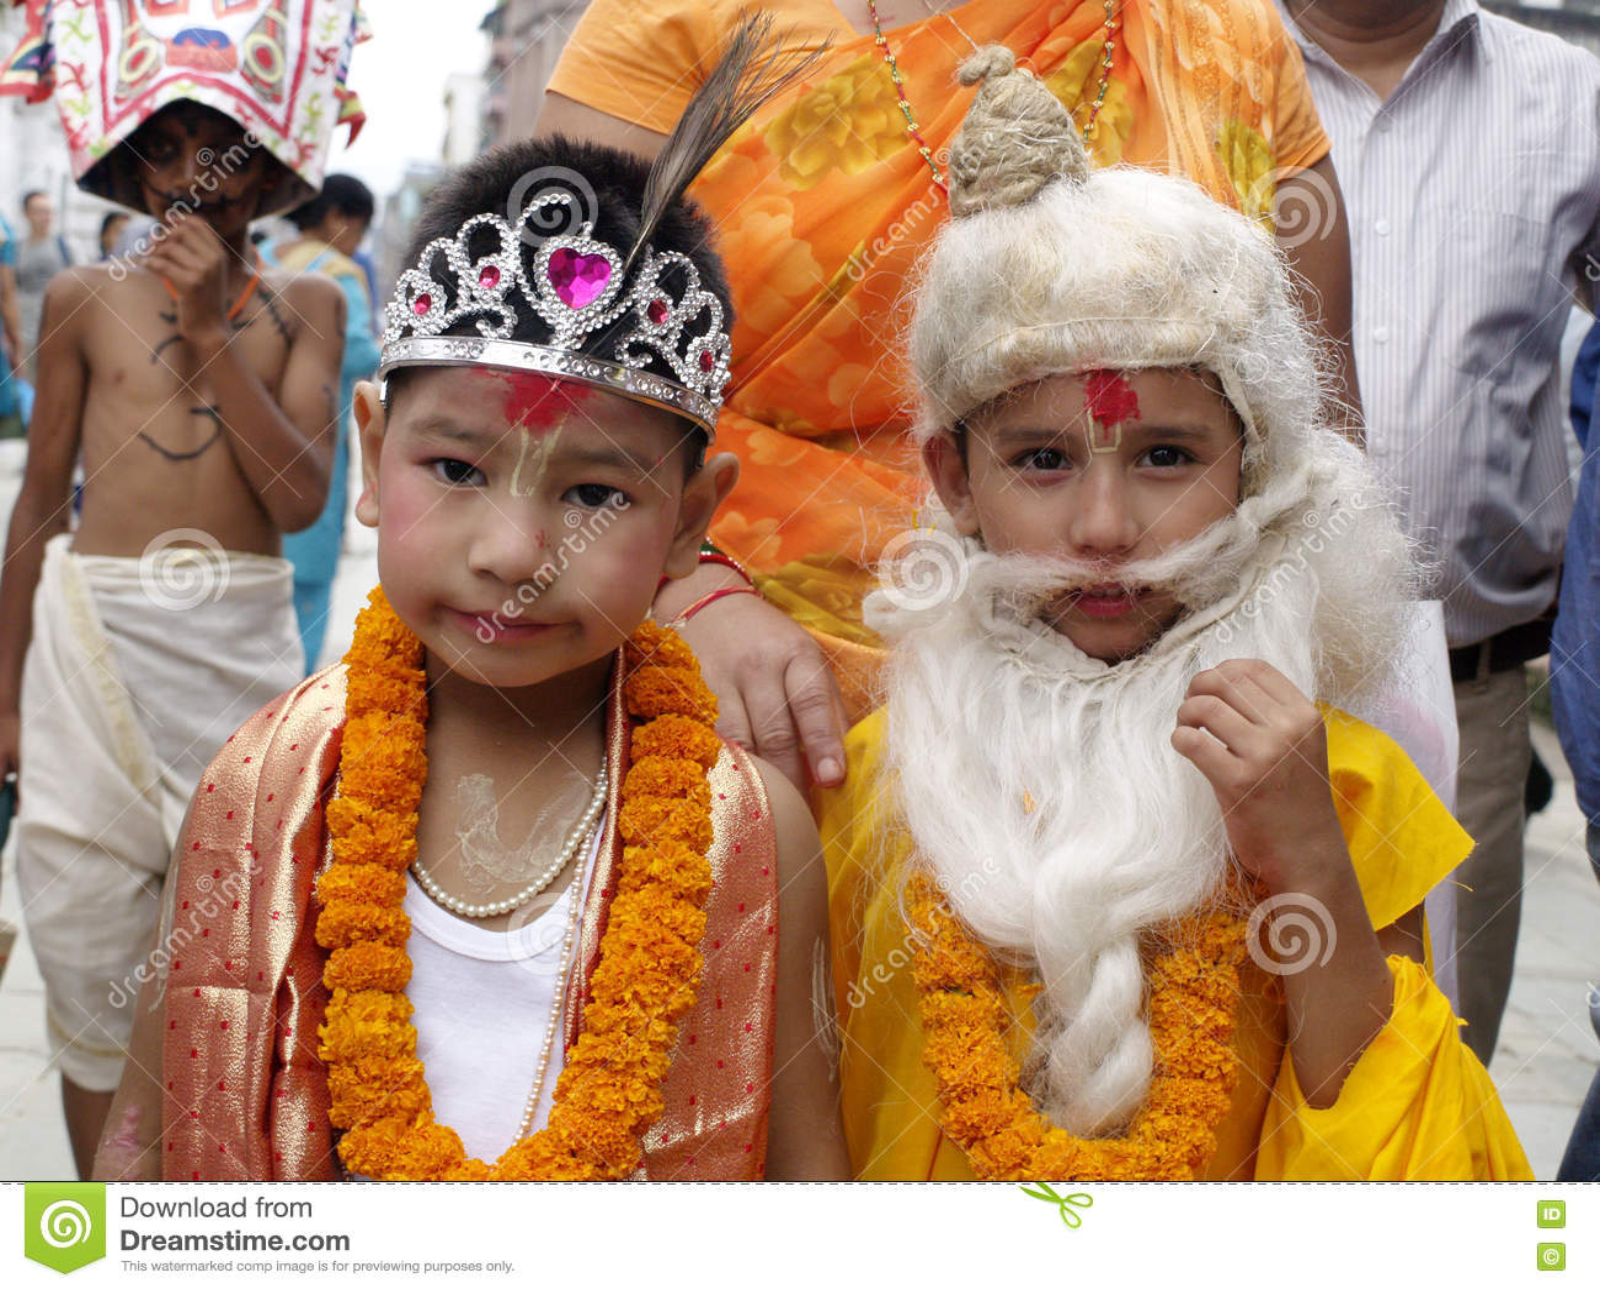 Children dressed as Hindu Gods in Gai Jatra (The festival of Cows)